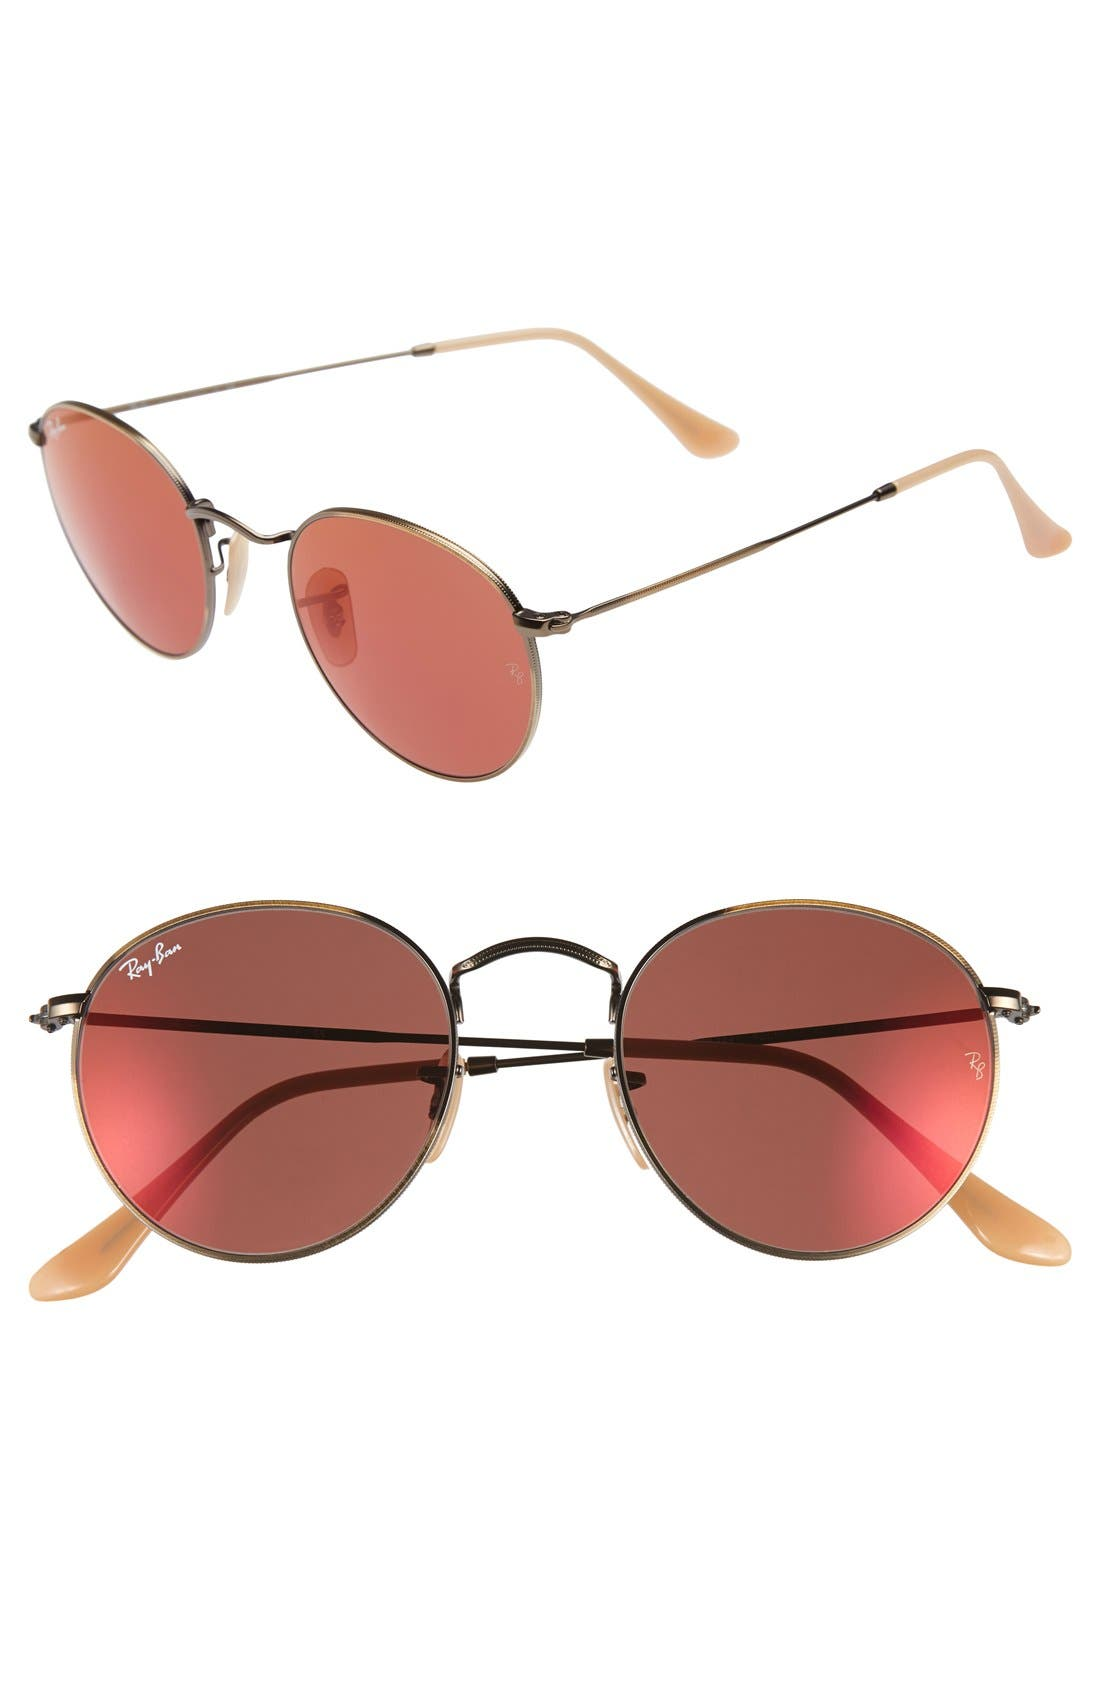 Icons 50mm Sunglasses,                             Main thumbnail 1, color,